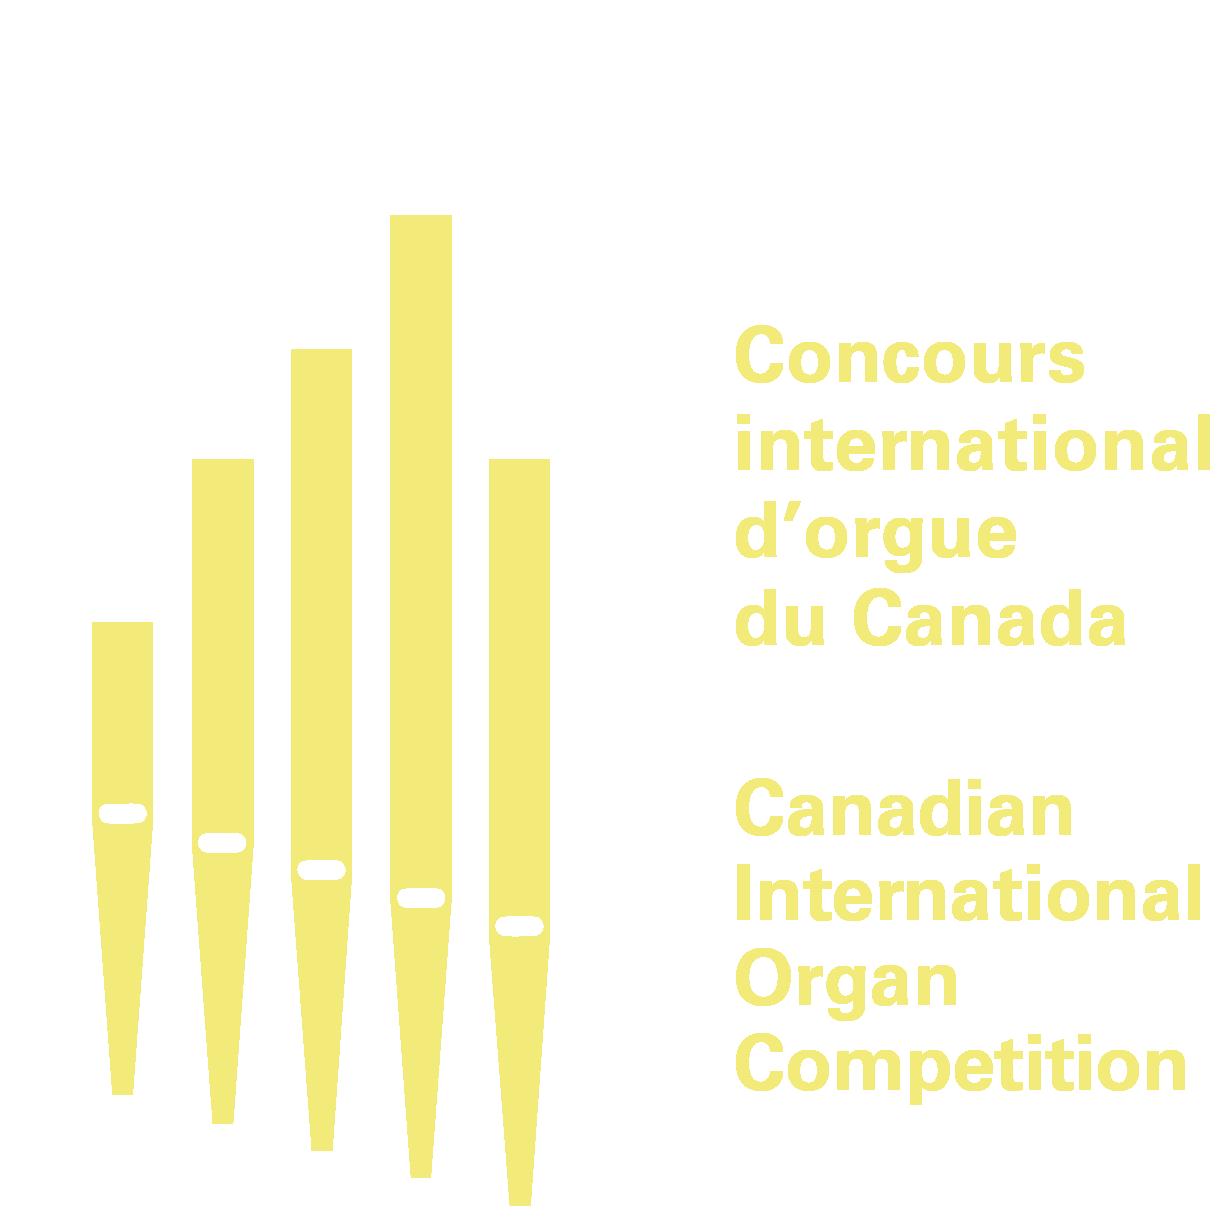 Canadian International Organ Competition